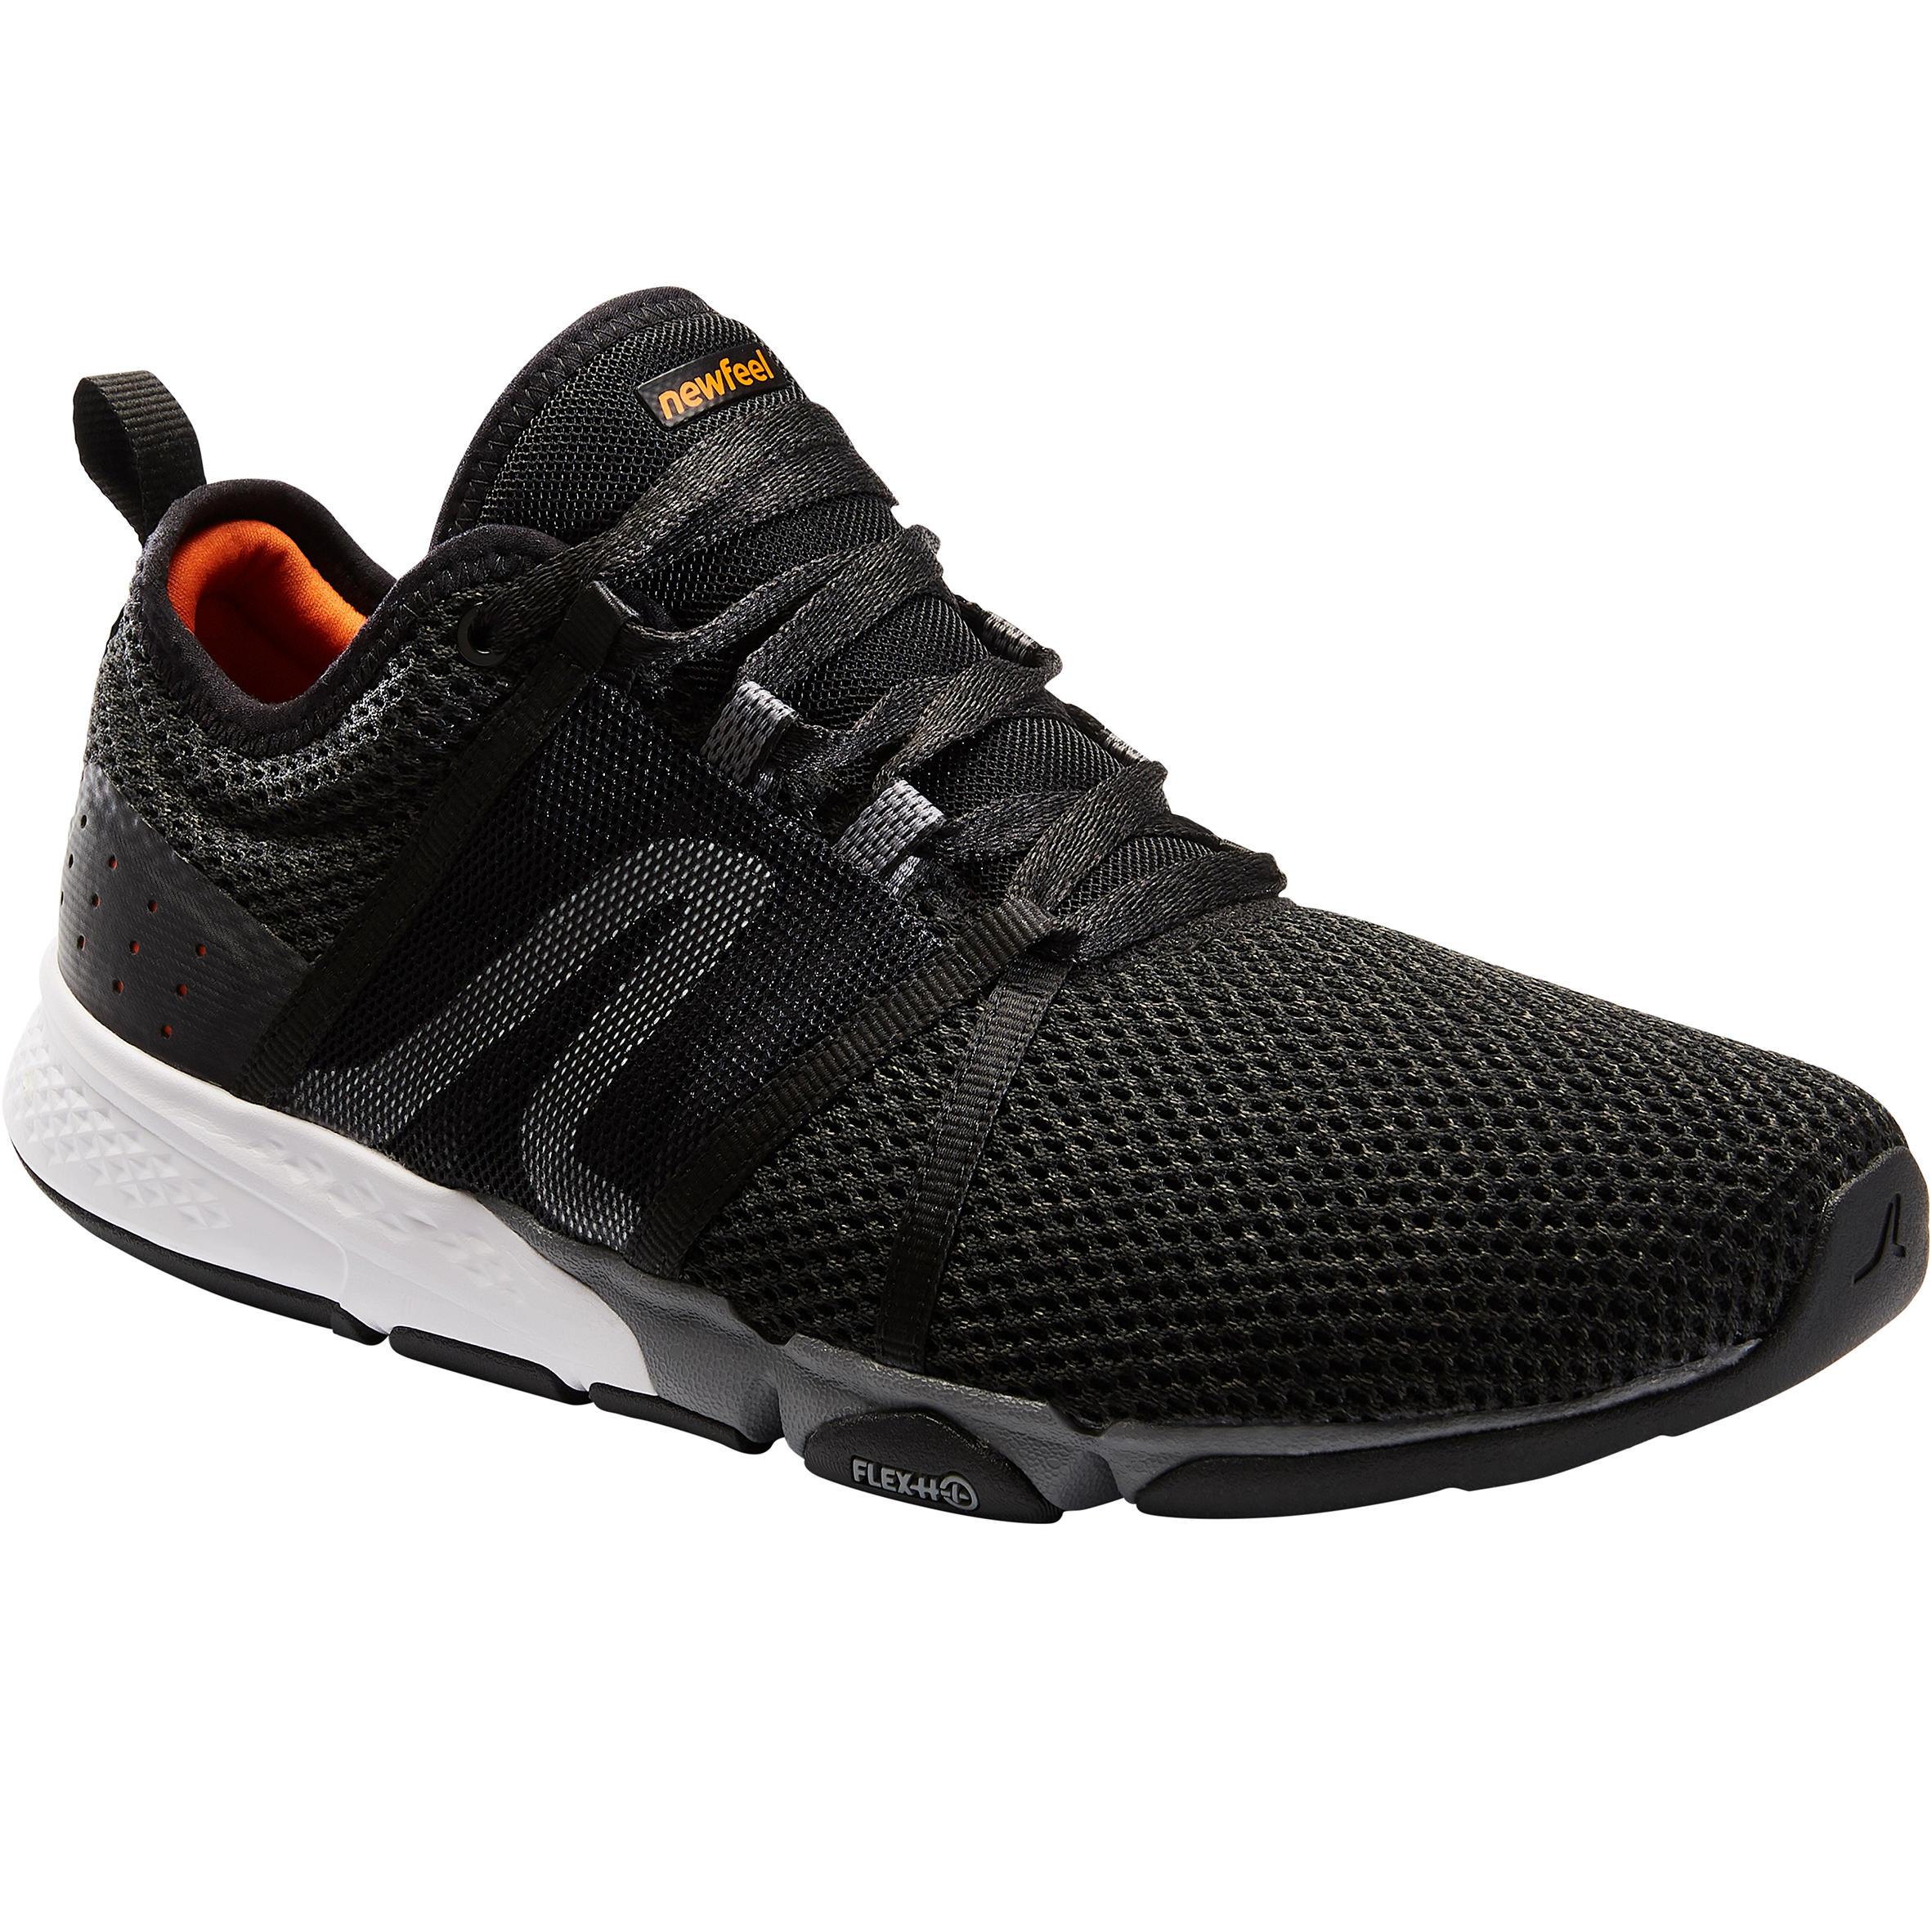 Newfeel Chaussures marche sportive homme PW 540 Flex-H+ noir / orange - Newfeel